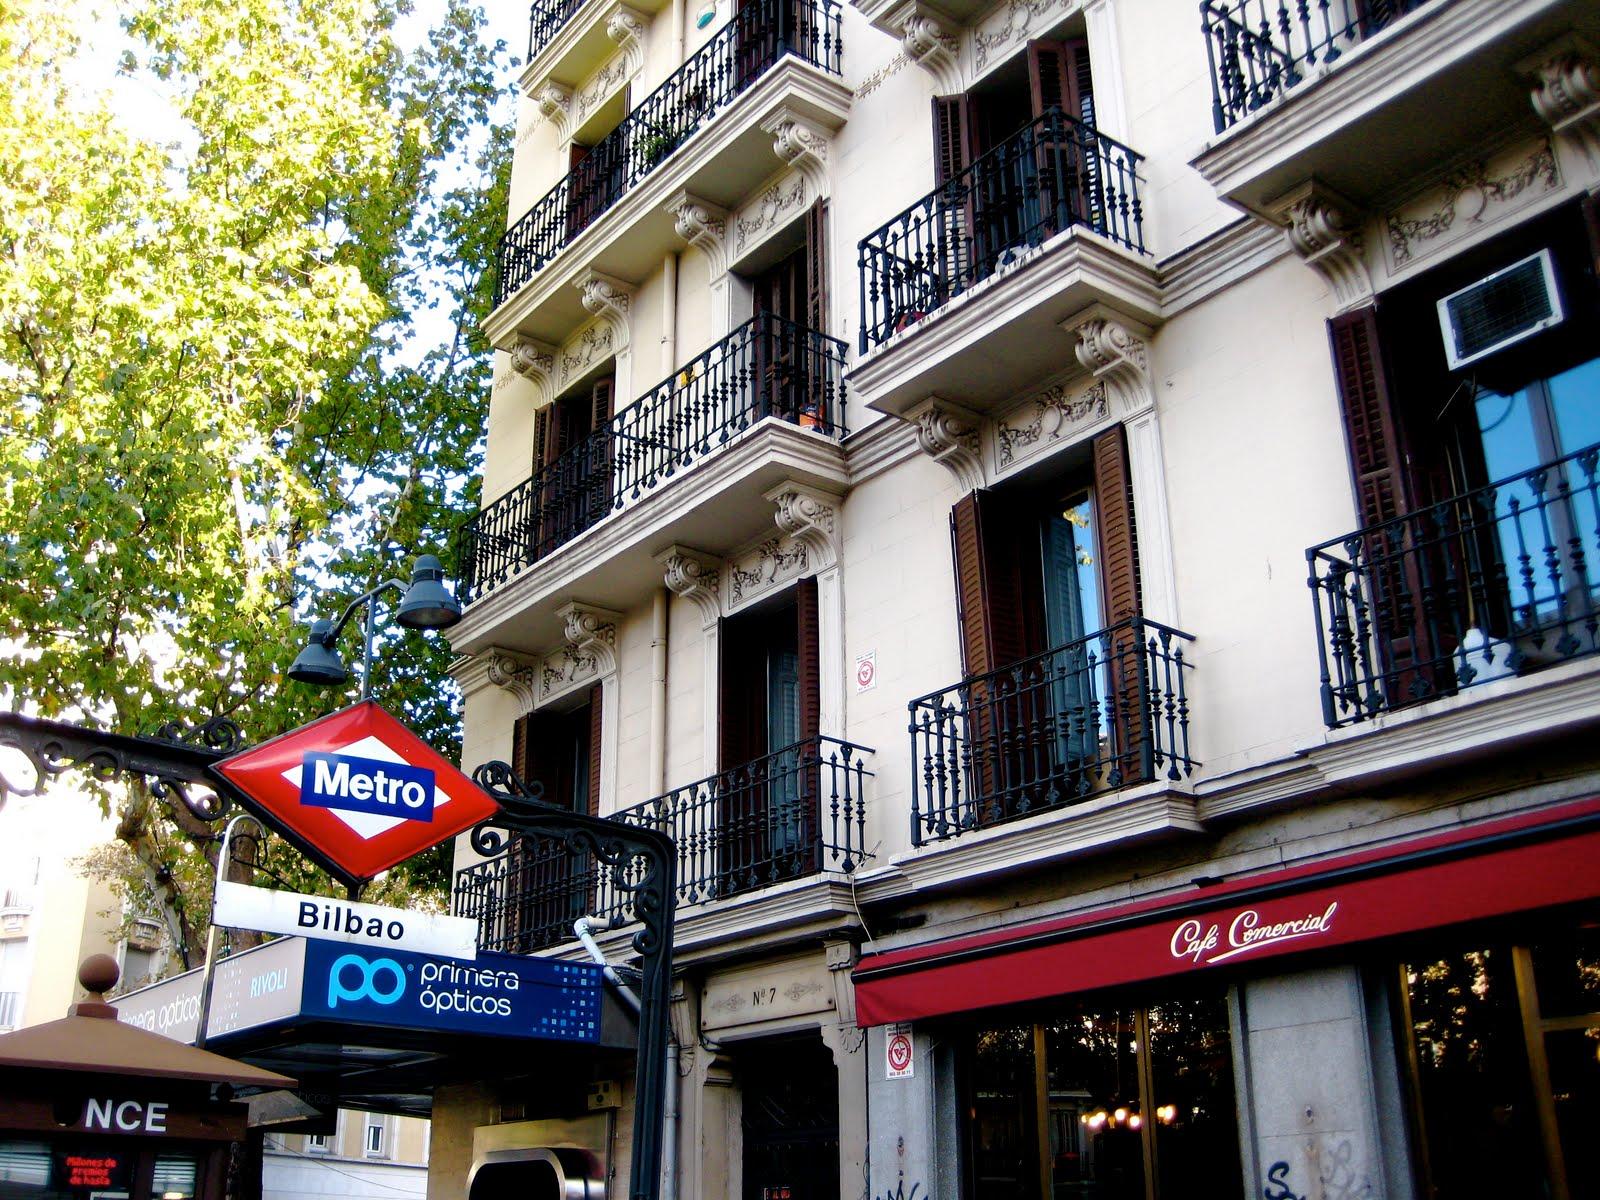 Lost in Spain: Favorite Spots in Madrid